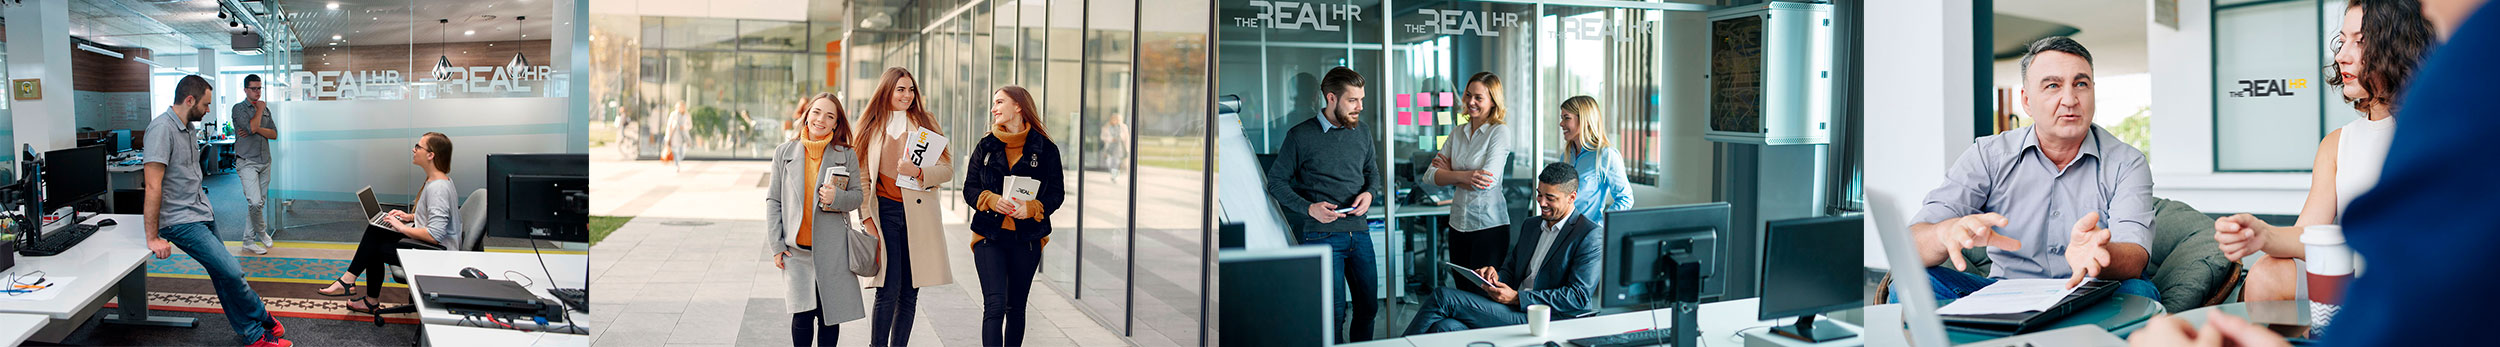 The Real HR | Carlos Villarin · Freelance Wordpress